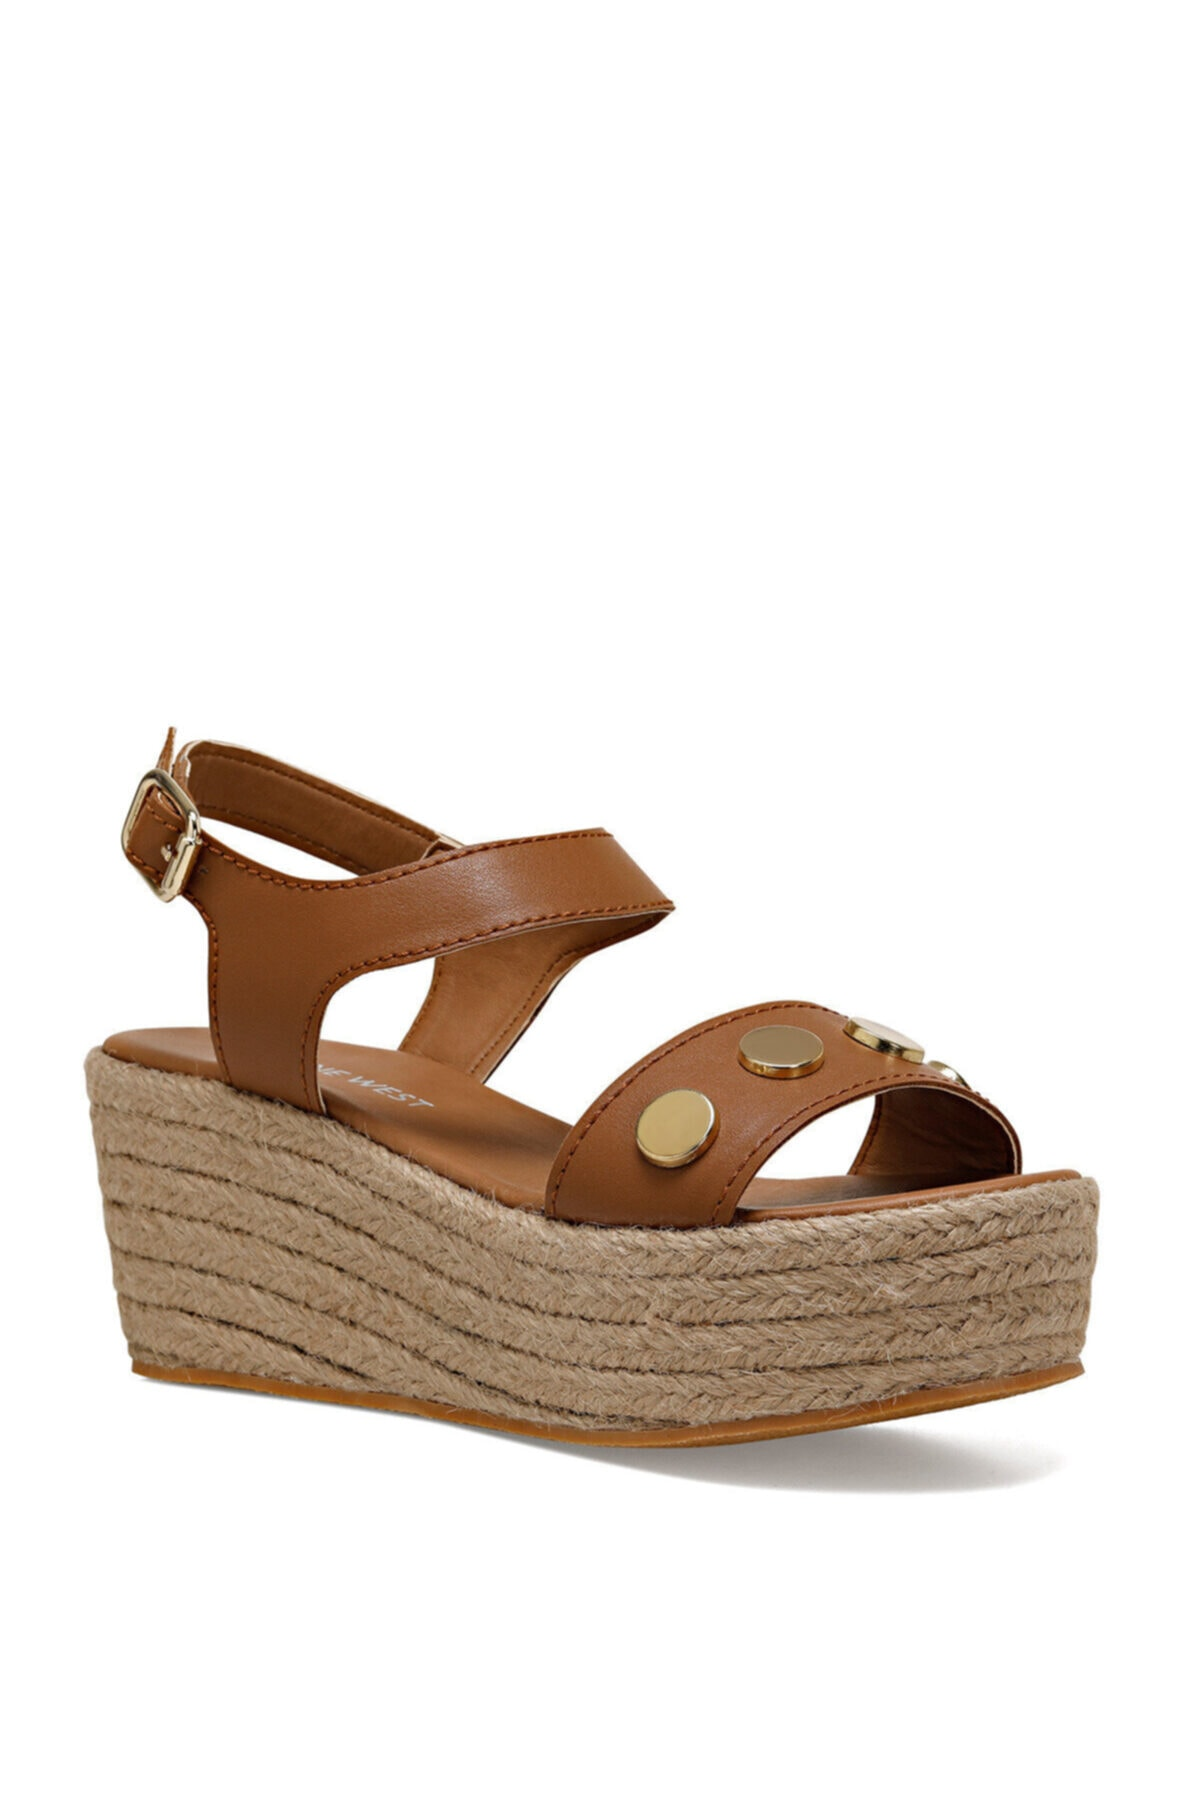 Nine West Valadon Taba Kadın Dolgu Topuklu Sandalet 2